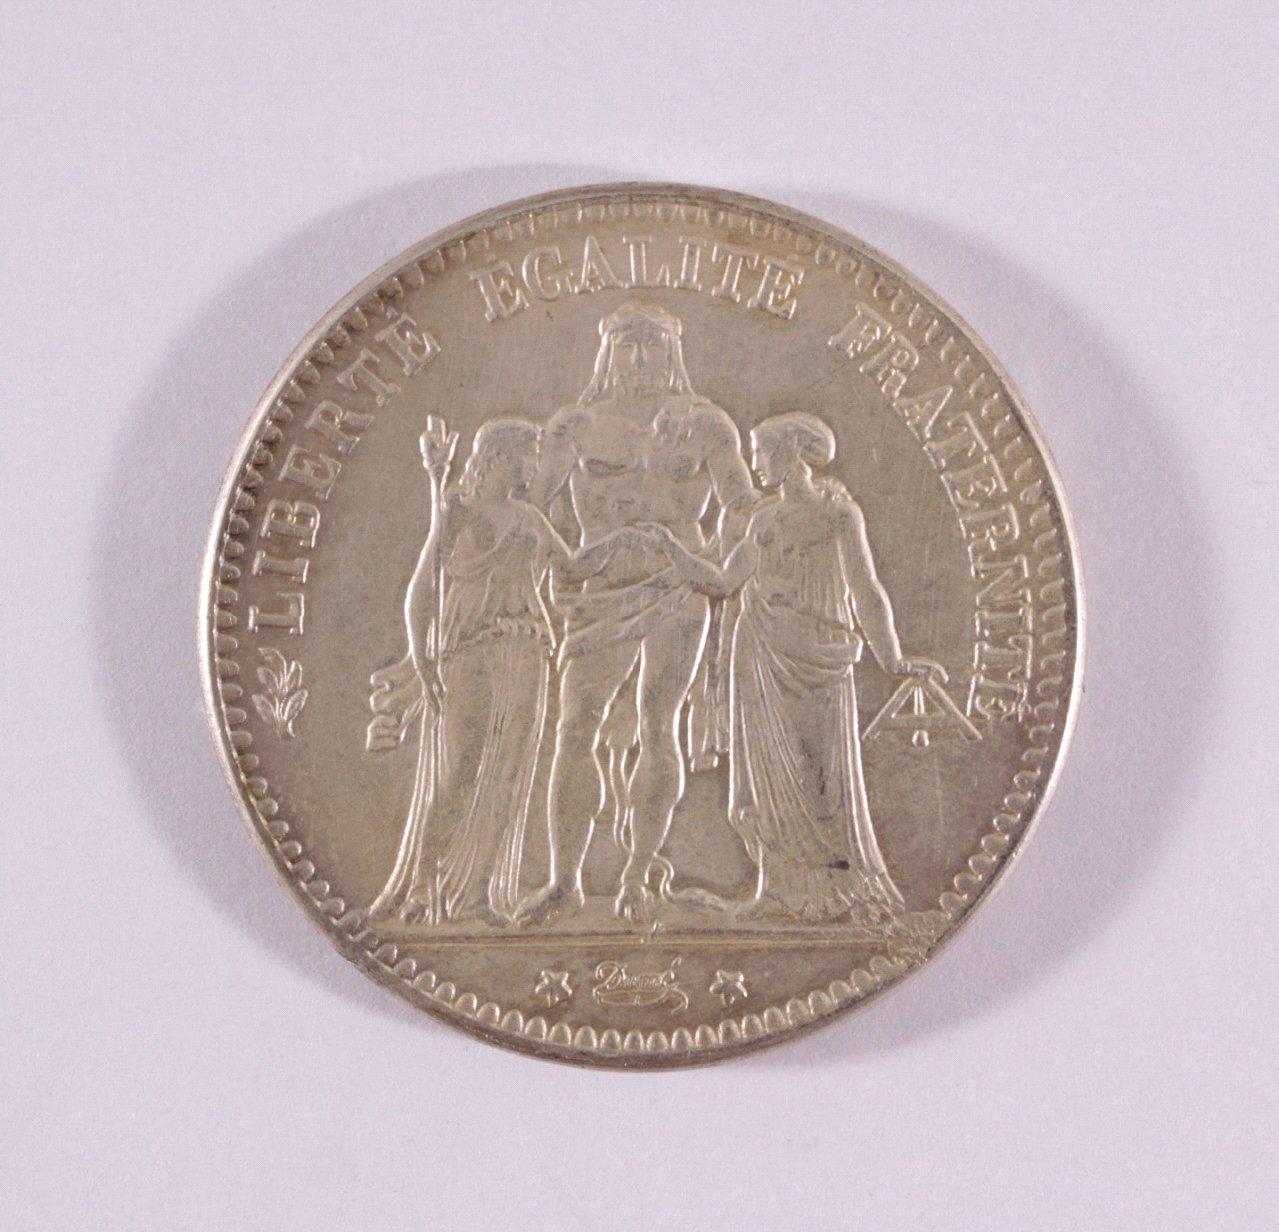 Frankreich, 5 Frances 1870, Napoleon III